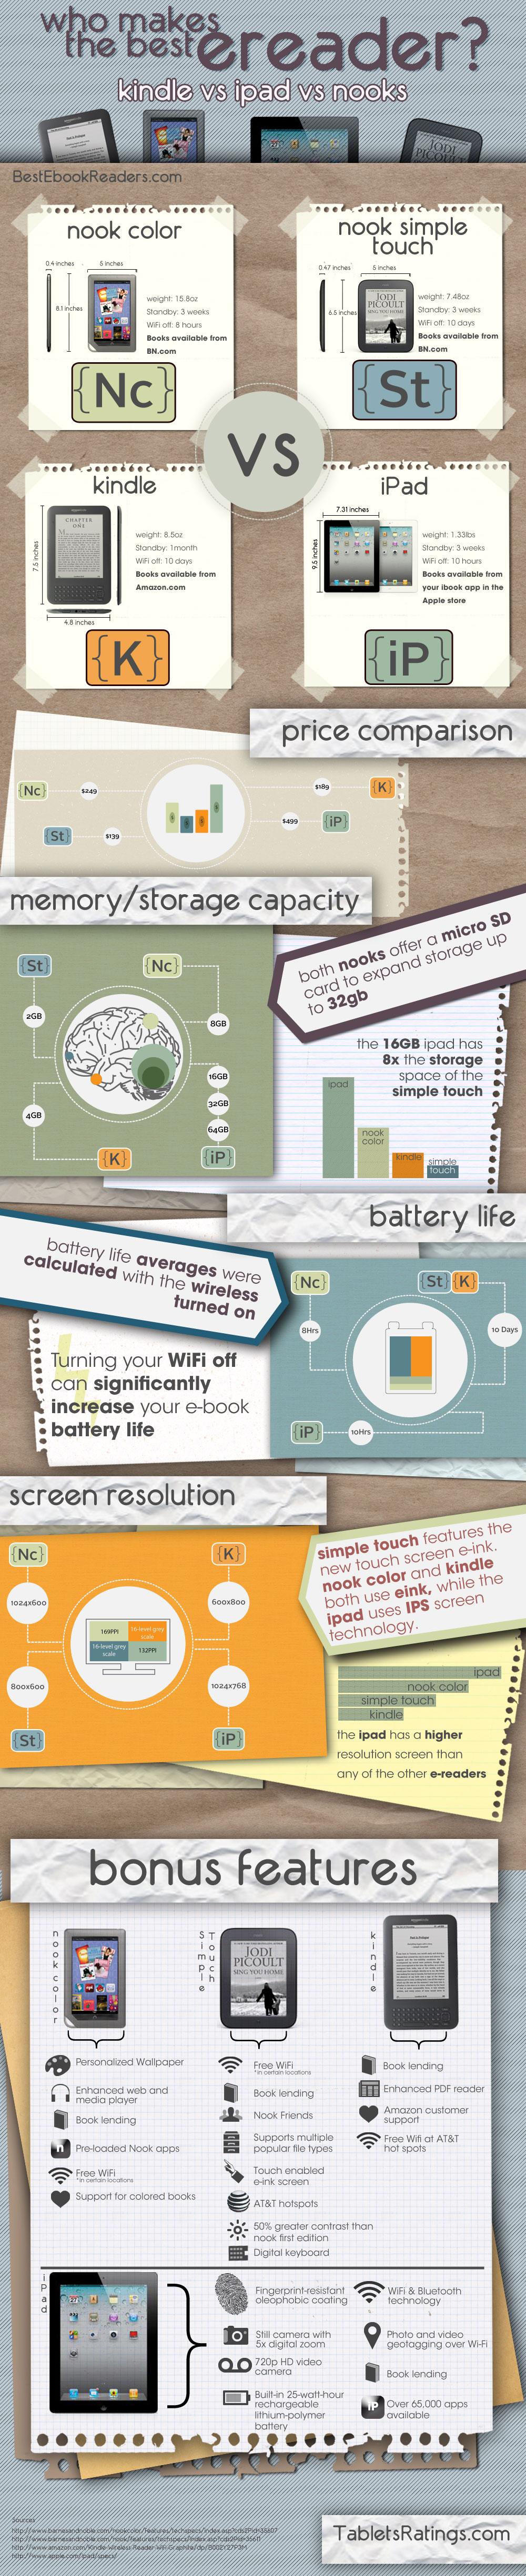 Nook E Reader Vs Kindle: Kindle Vs. IPad 2 Vs. NOOK Color Vs. Simple Touch NOOK